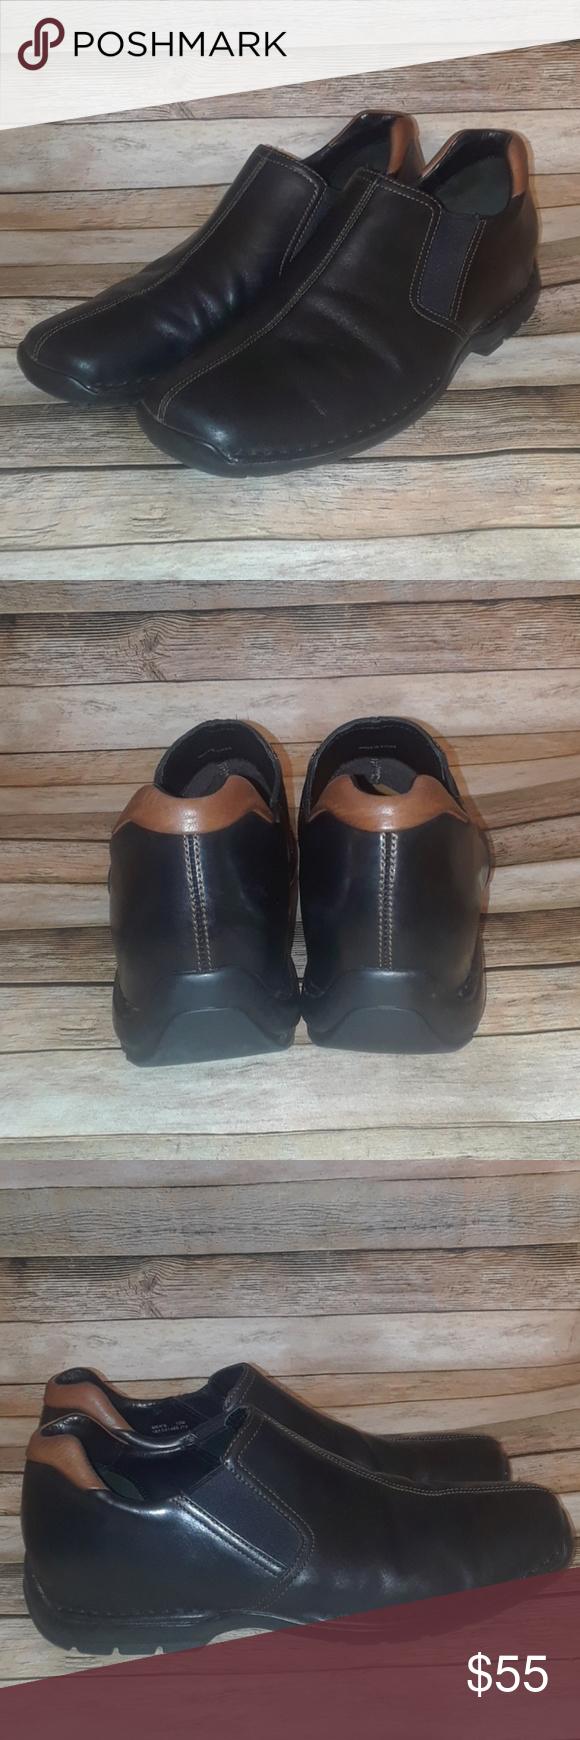 ee8daa6e5df Cole Haan Zeno Black Slip On Leather Loafer 12 Cole Haan Zeno Slip On  Leather Loafer in Size 12. Slightly polished black leather upper